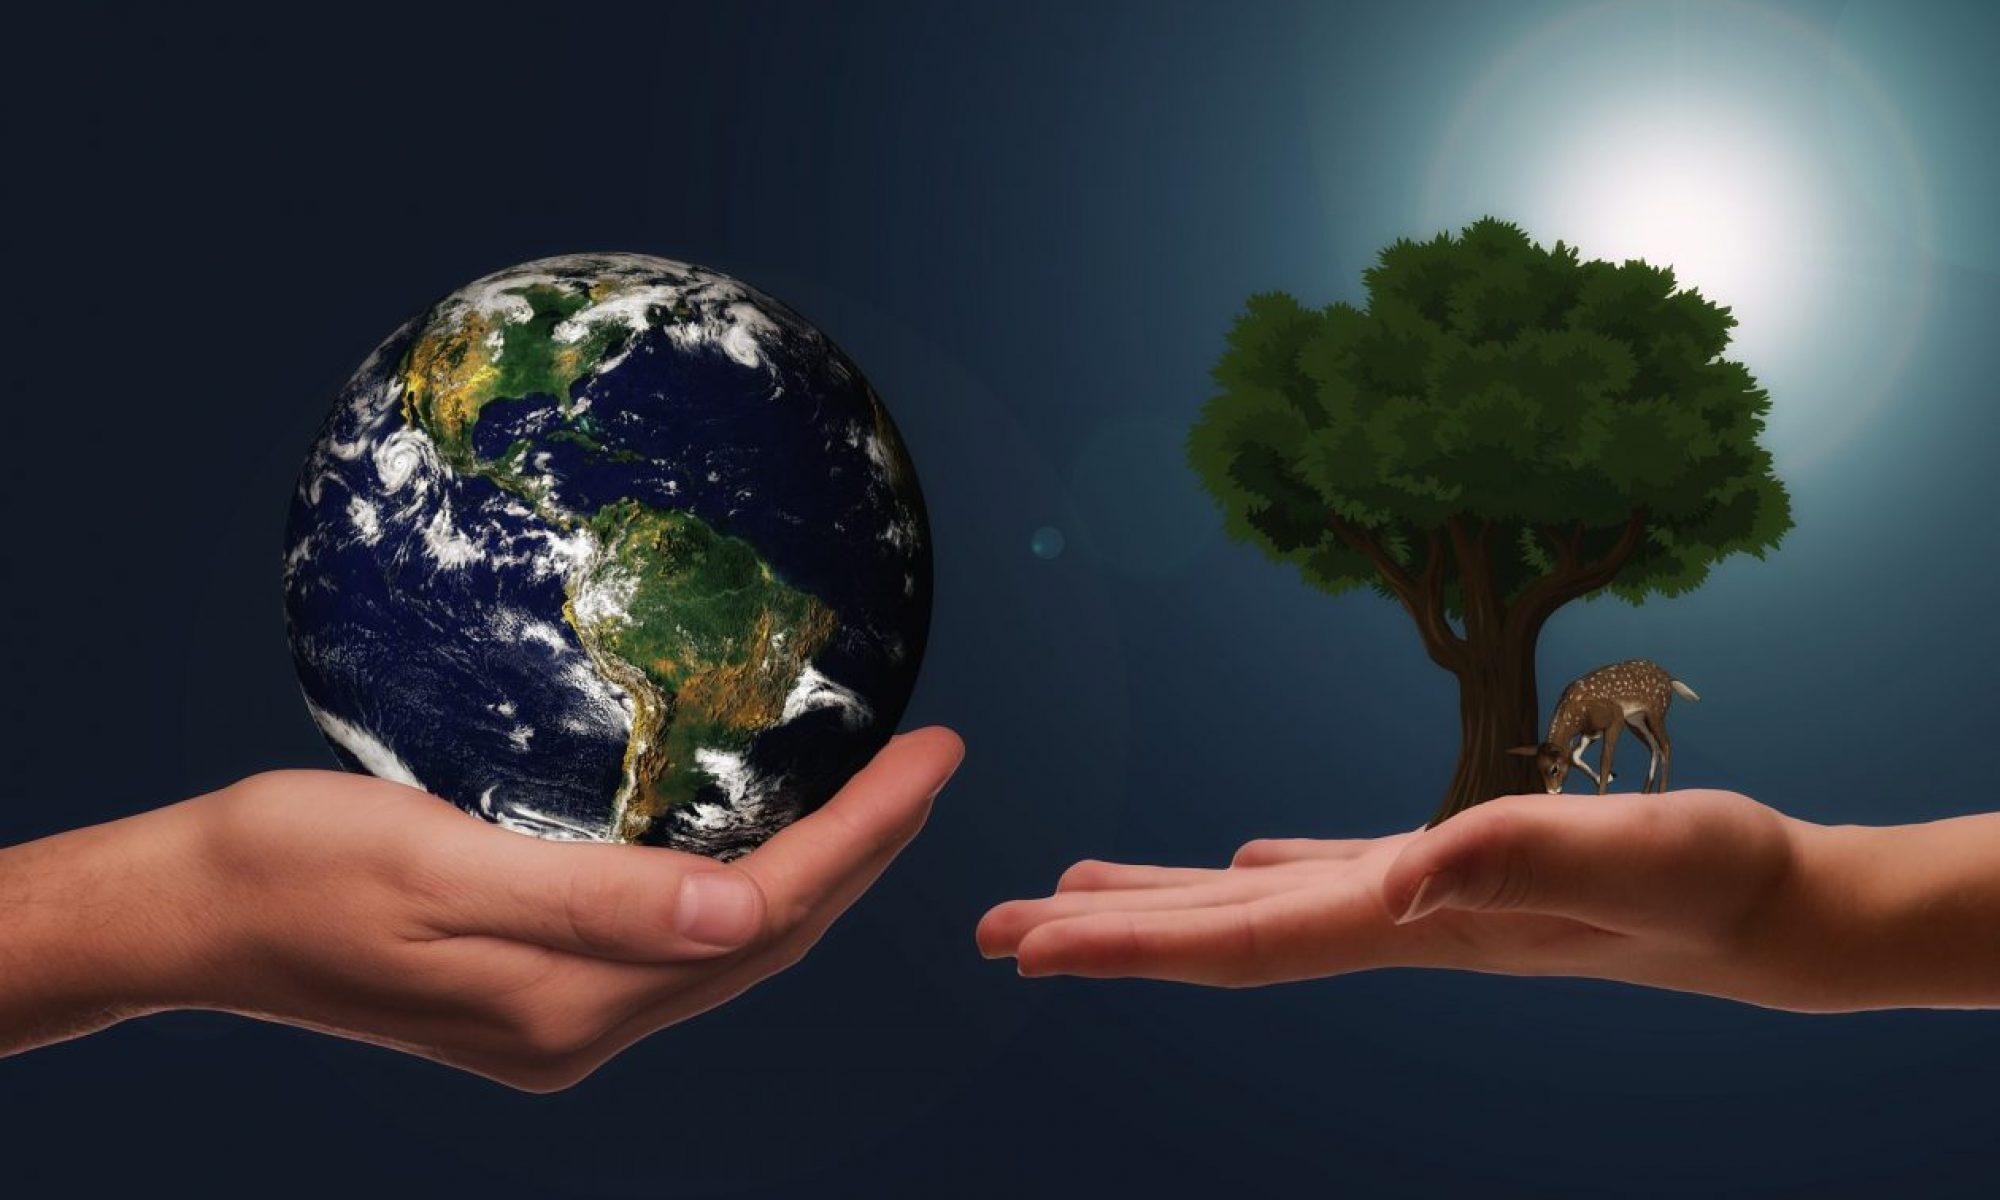 Ross's Sustainable Development Reflective Blog